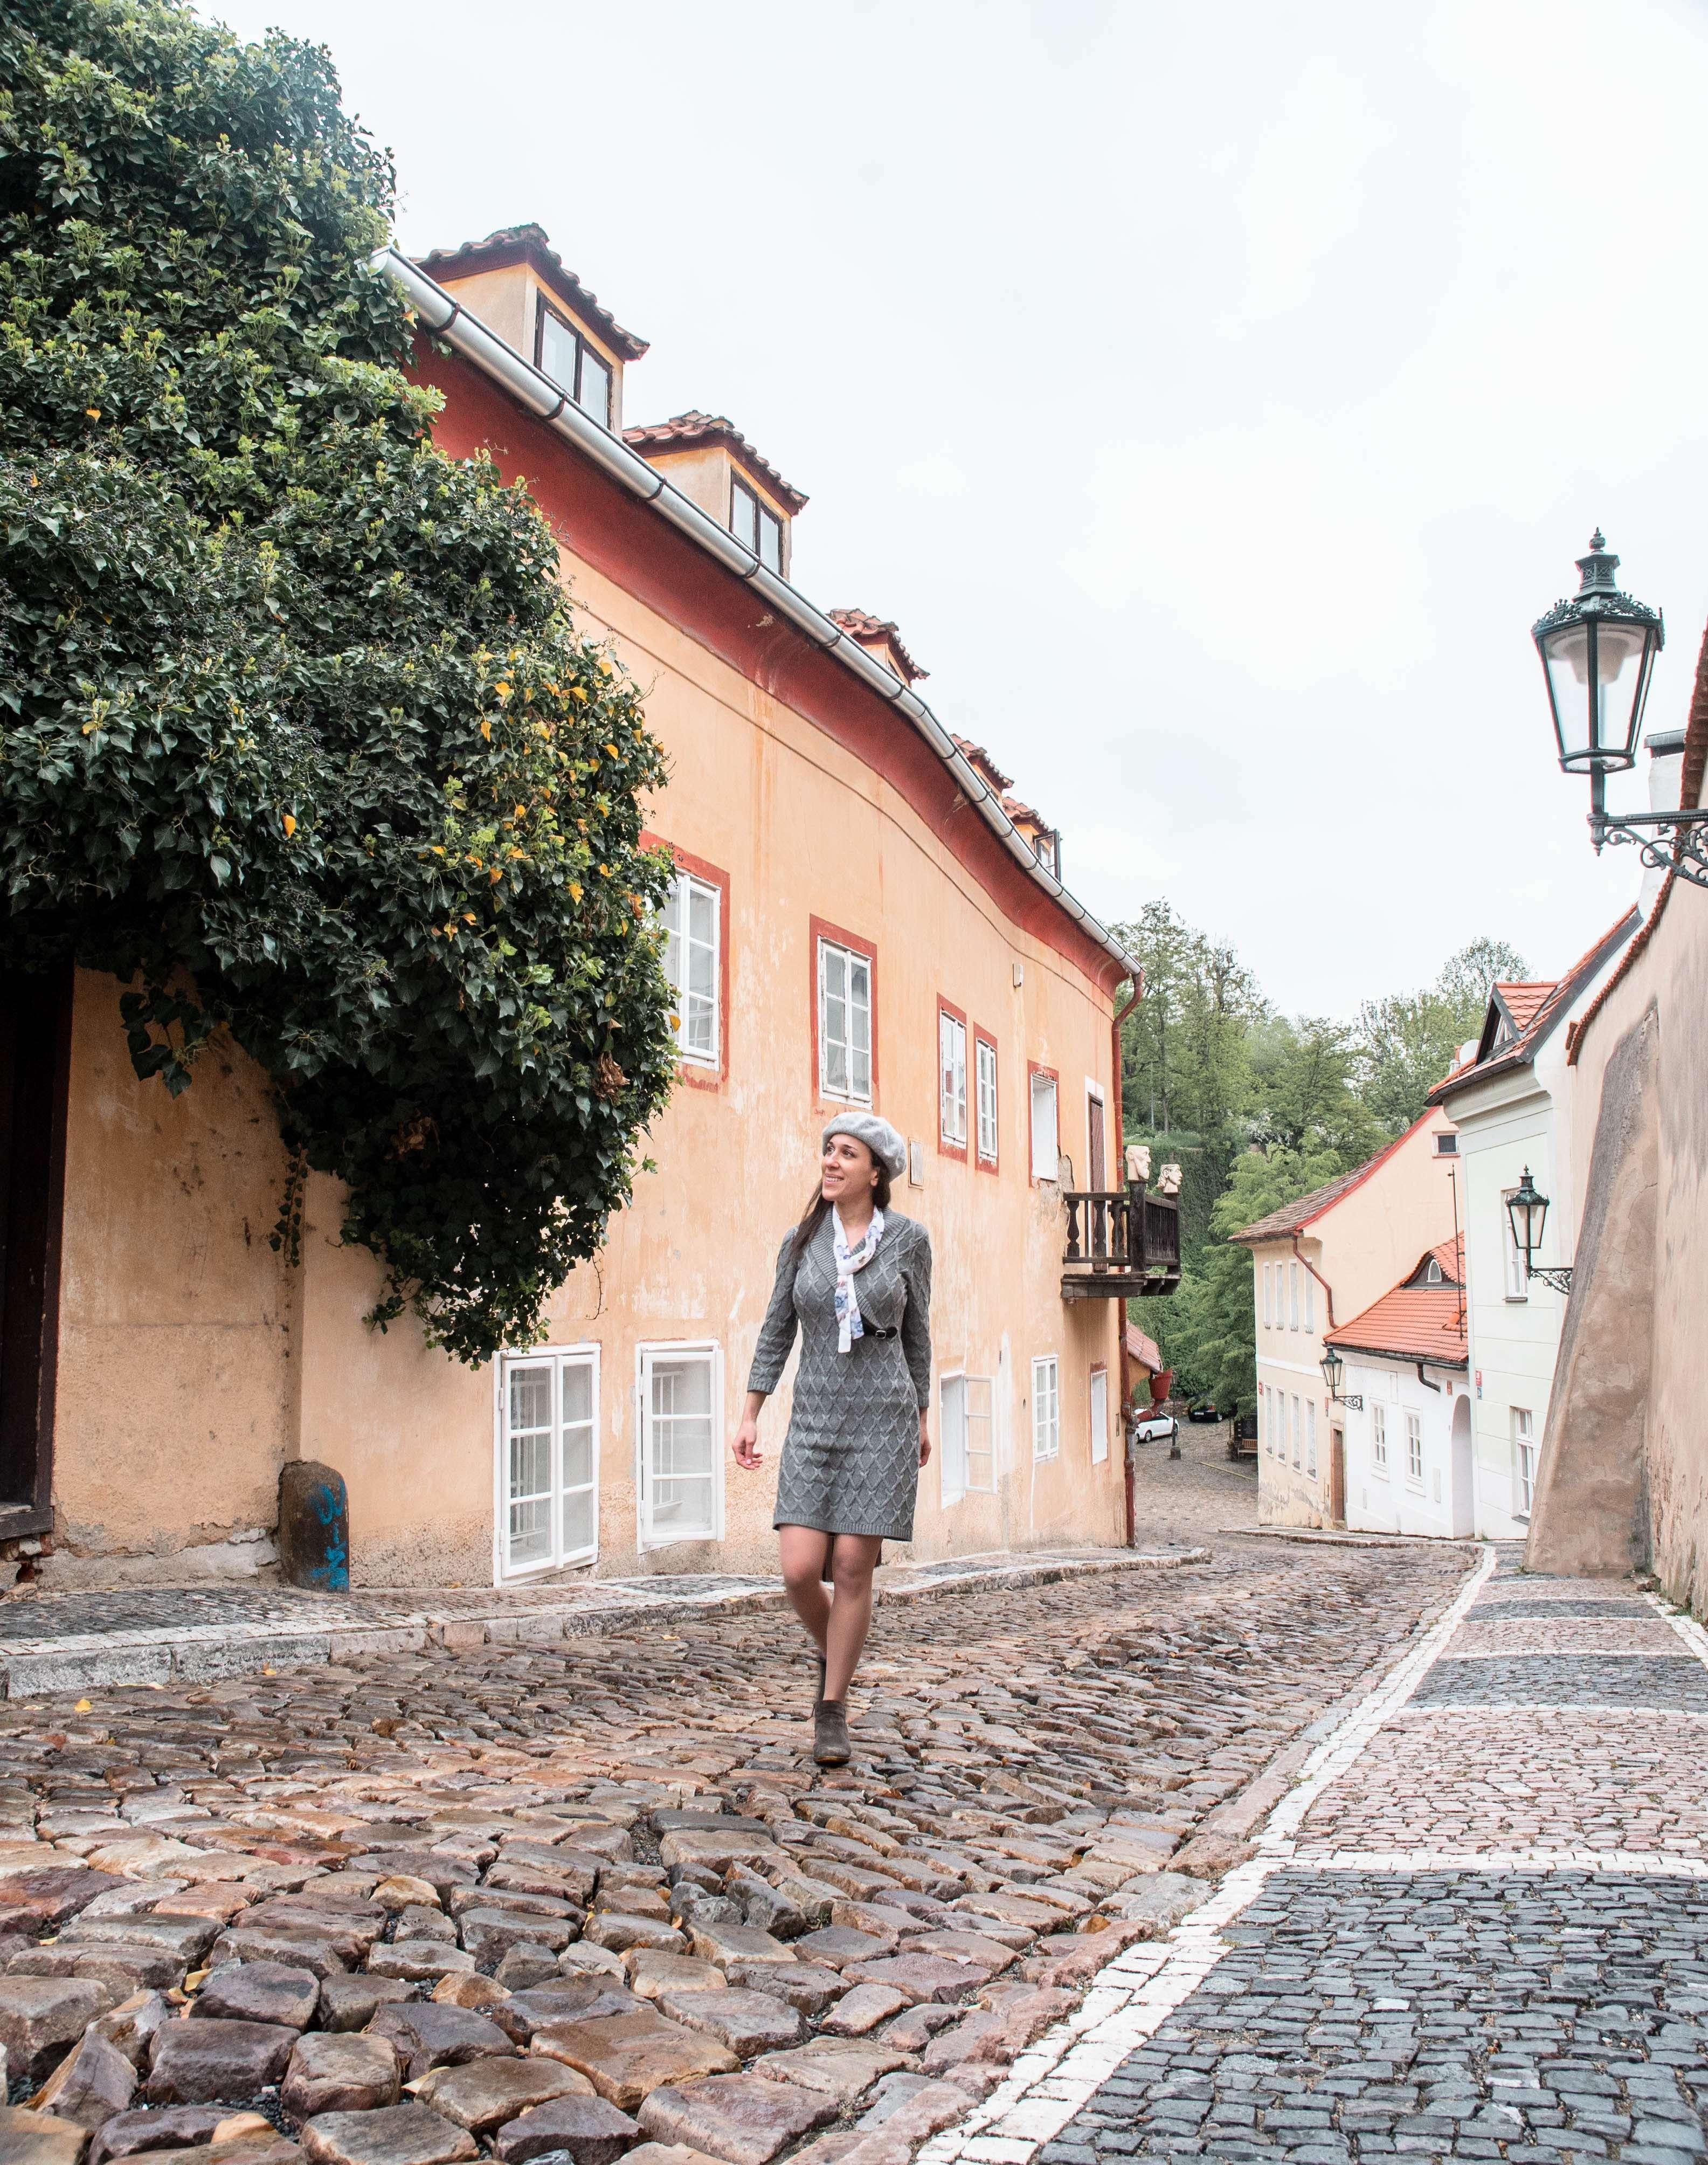 Novy Svet charming street